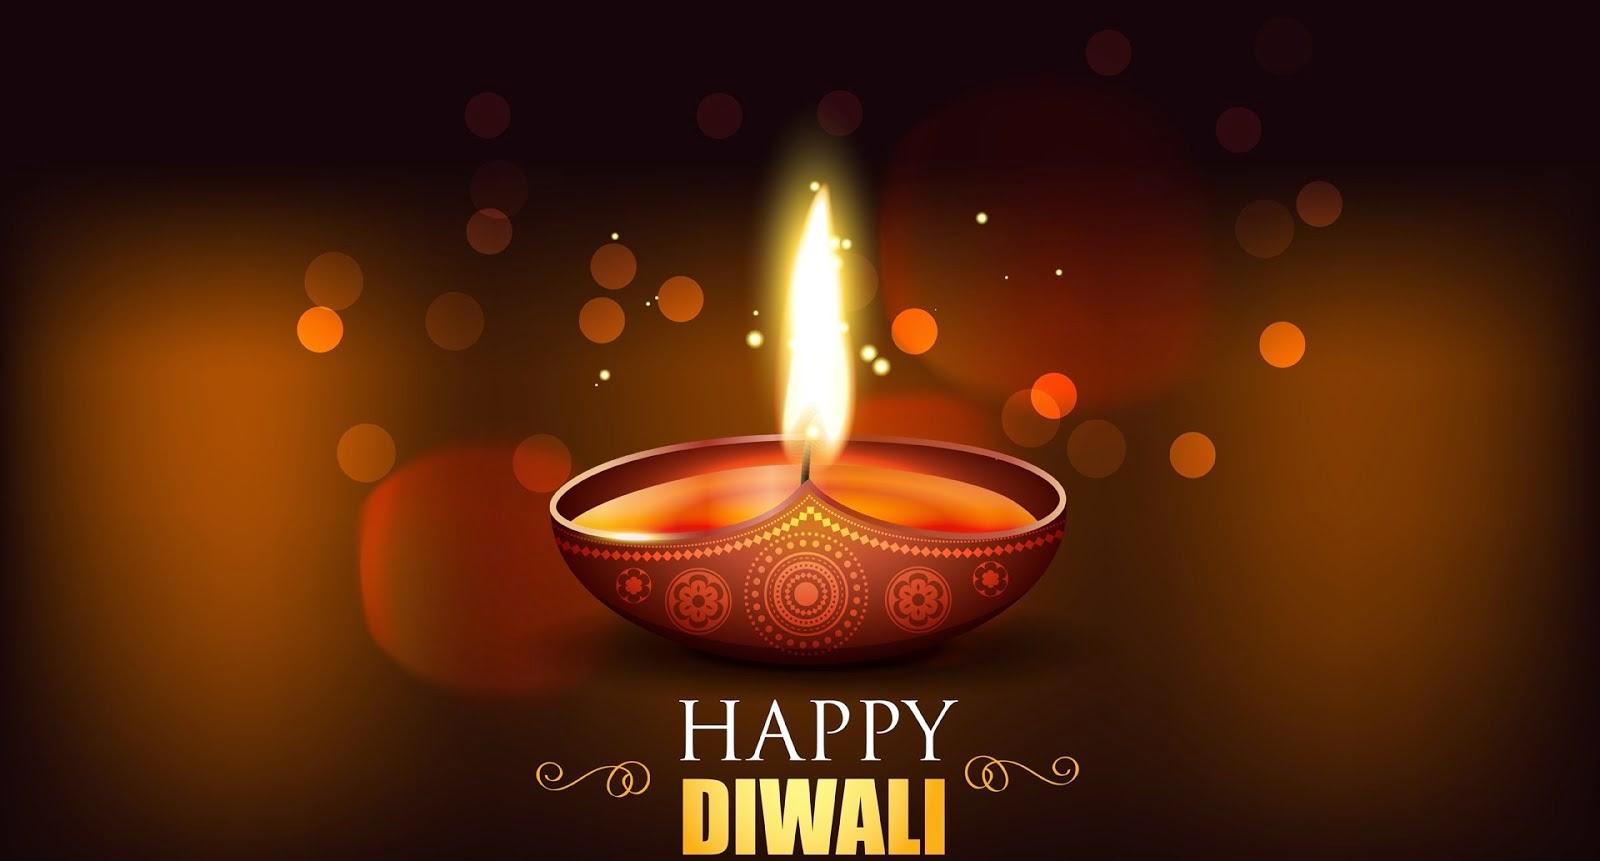 happy diwali hd wallpapers - photo #29